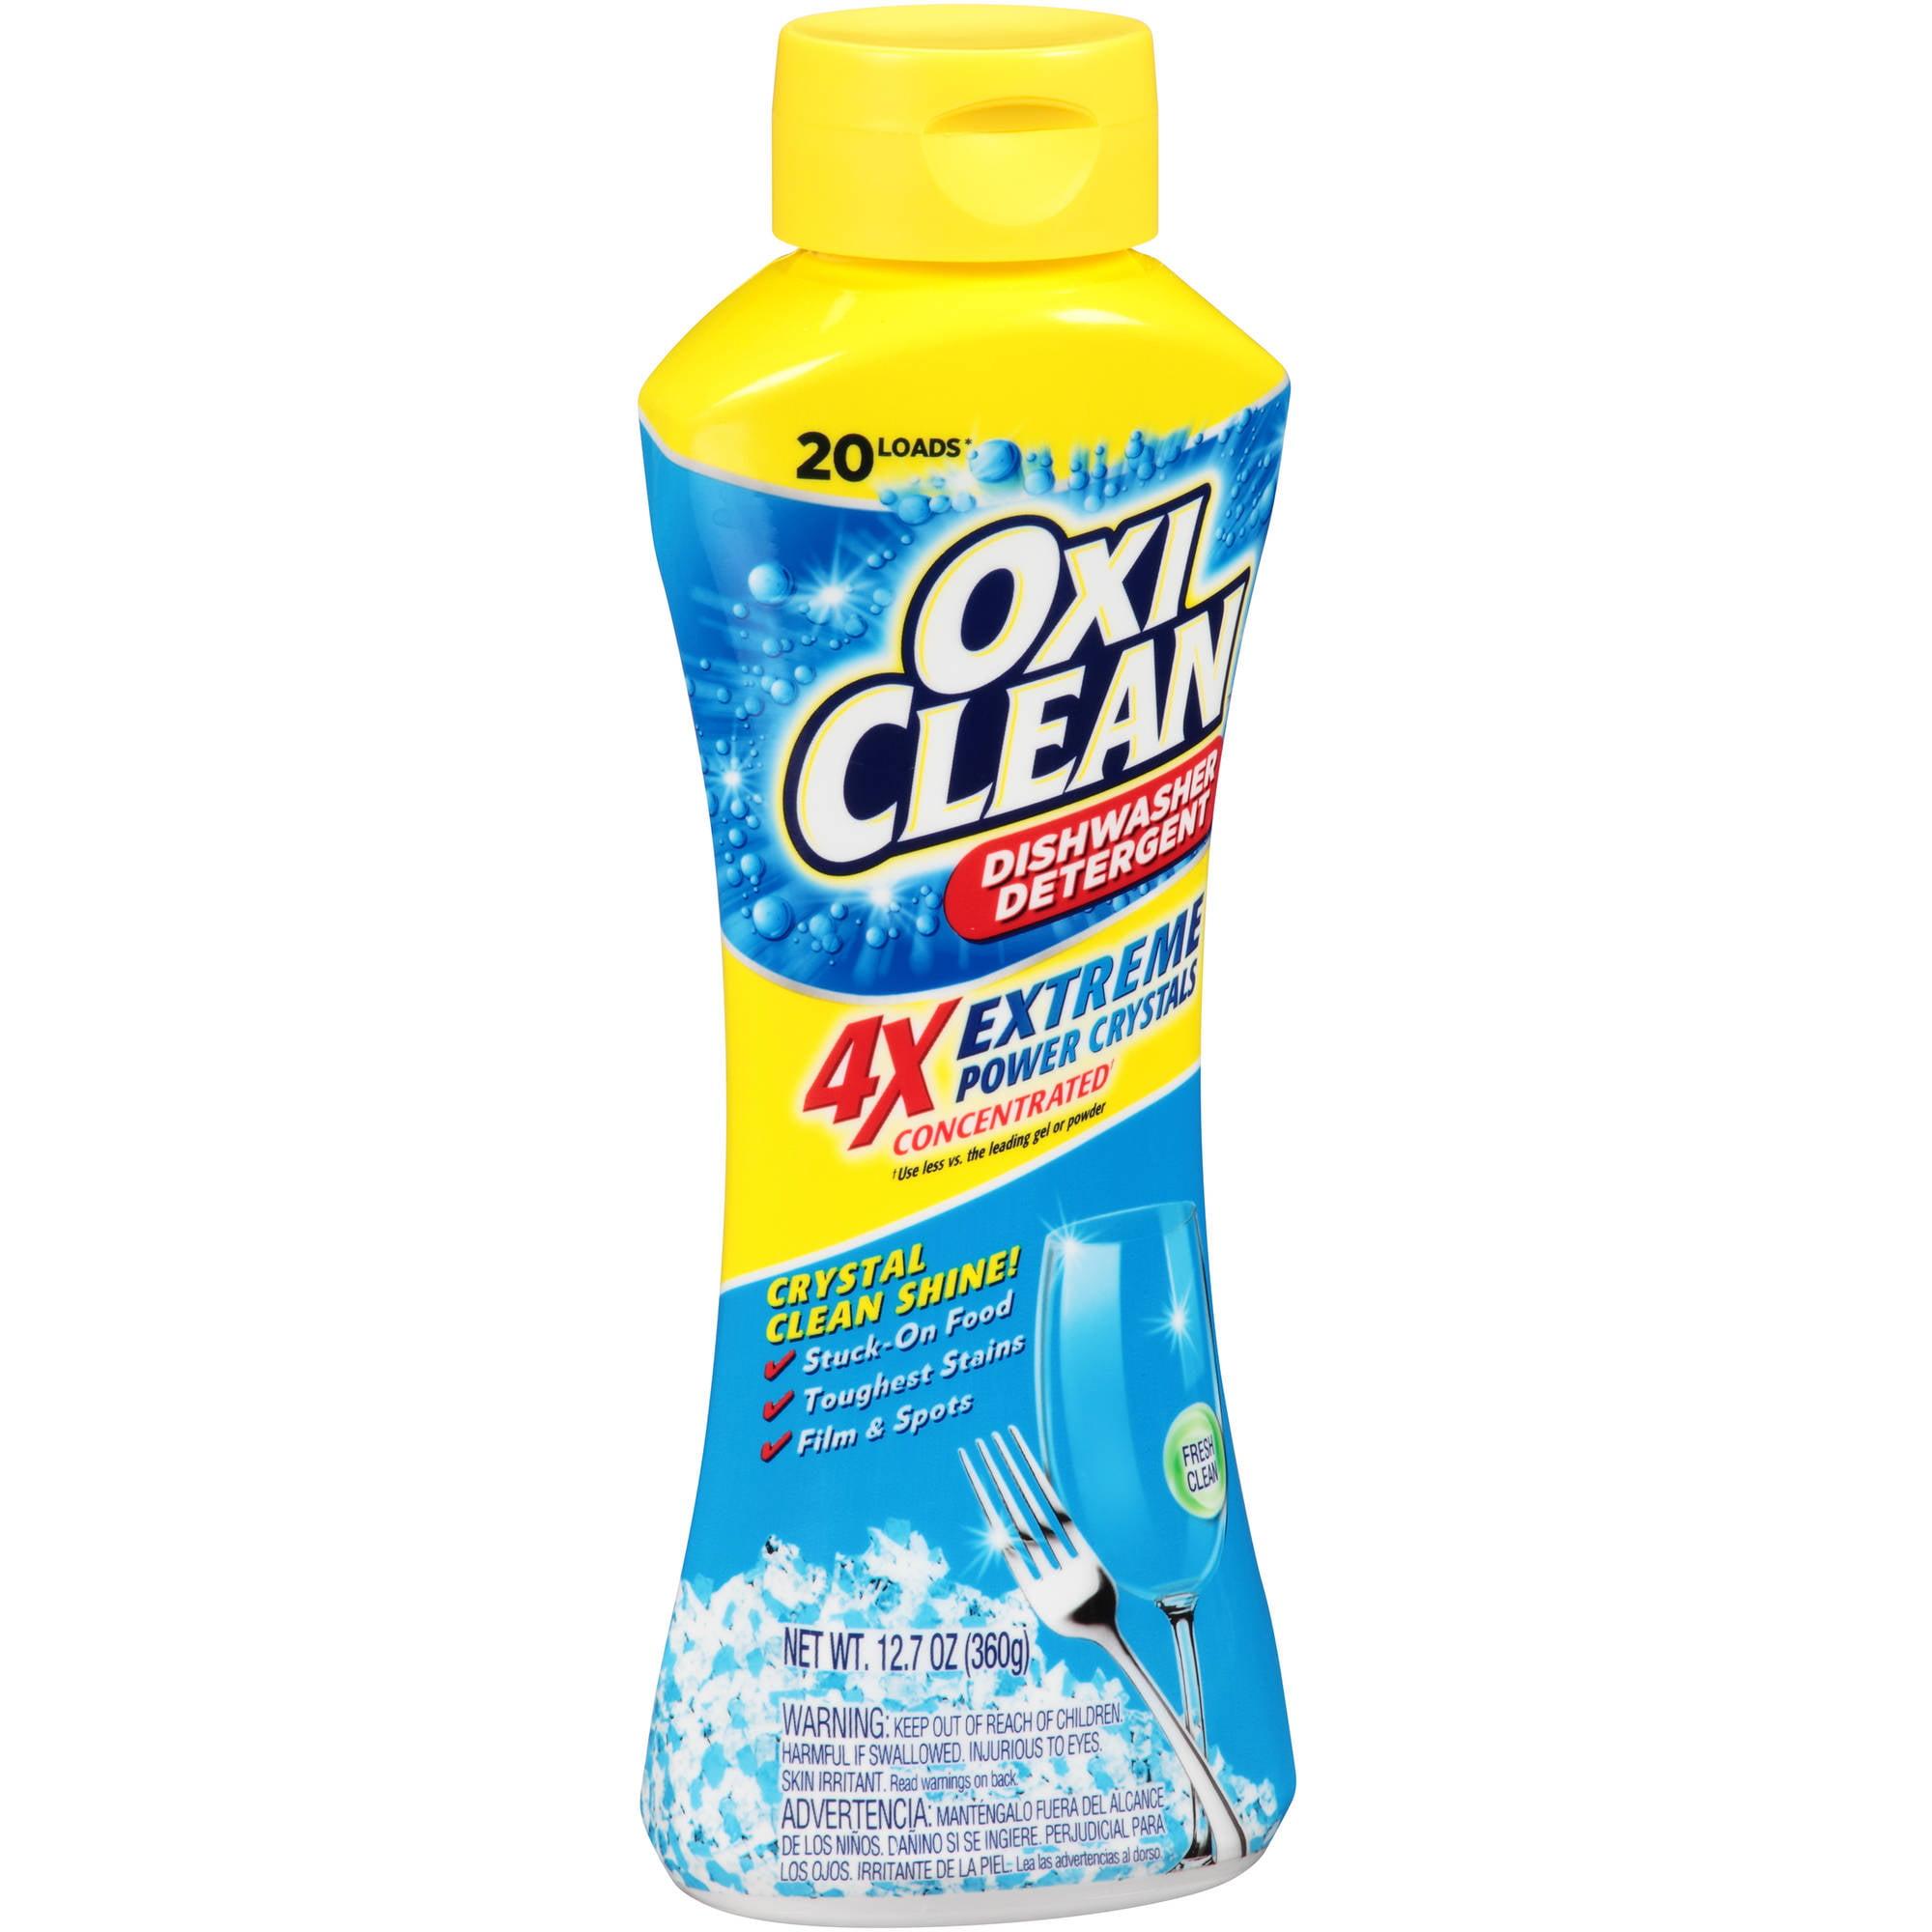 Gentil OxiClean Lemon Clean Dishwasher Detergent, 12.7 Oz   Walmart.com